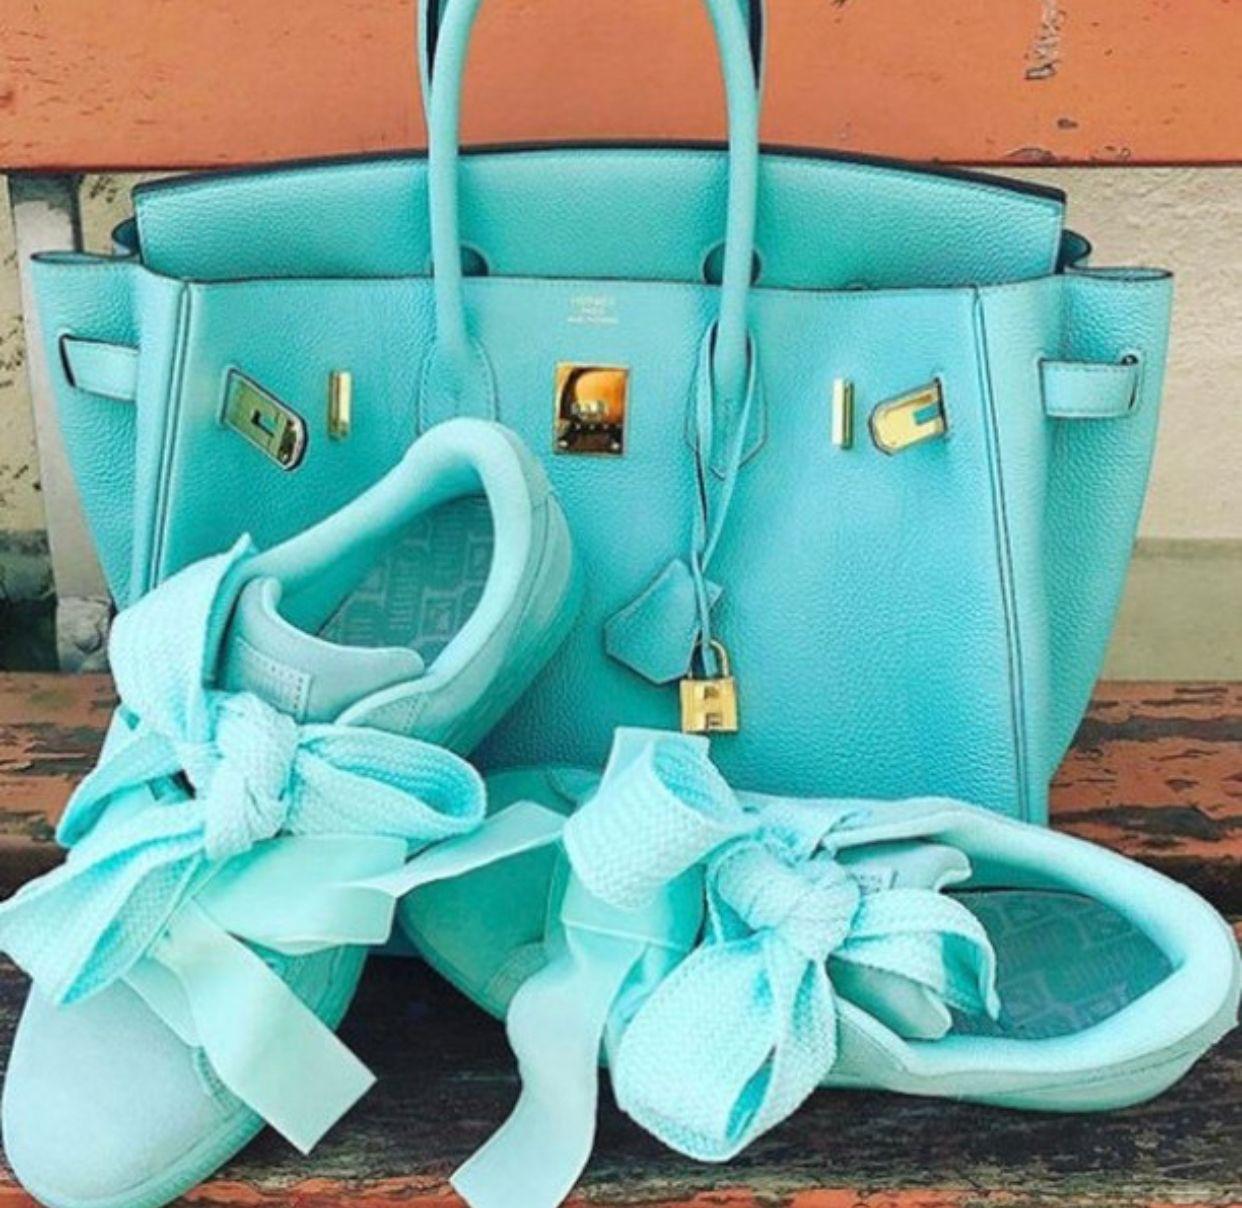 Tiffany Blue Hermes Birkin Bag And Puma Hermes Bag Birkin Hermes Birkin Birkin